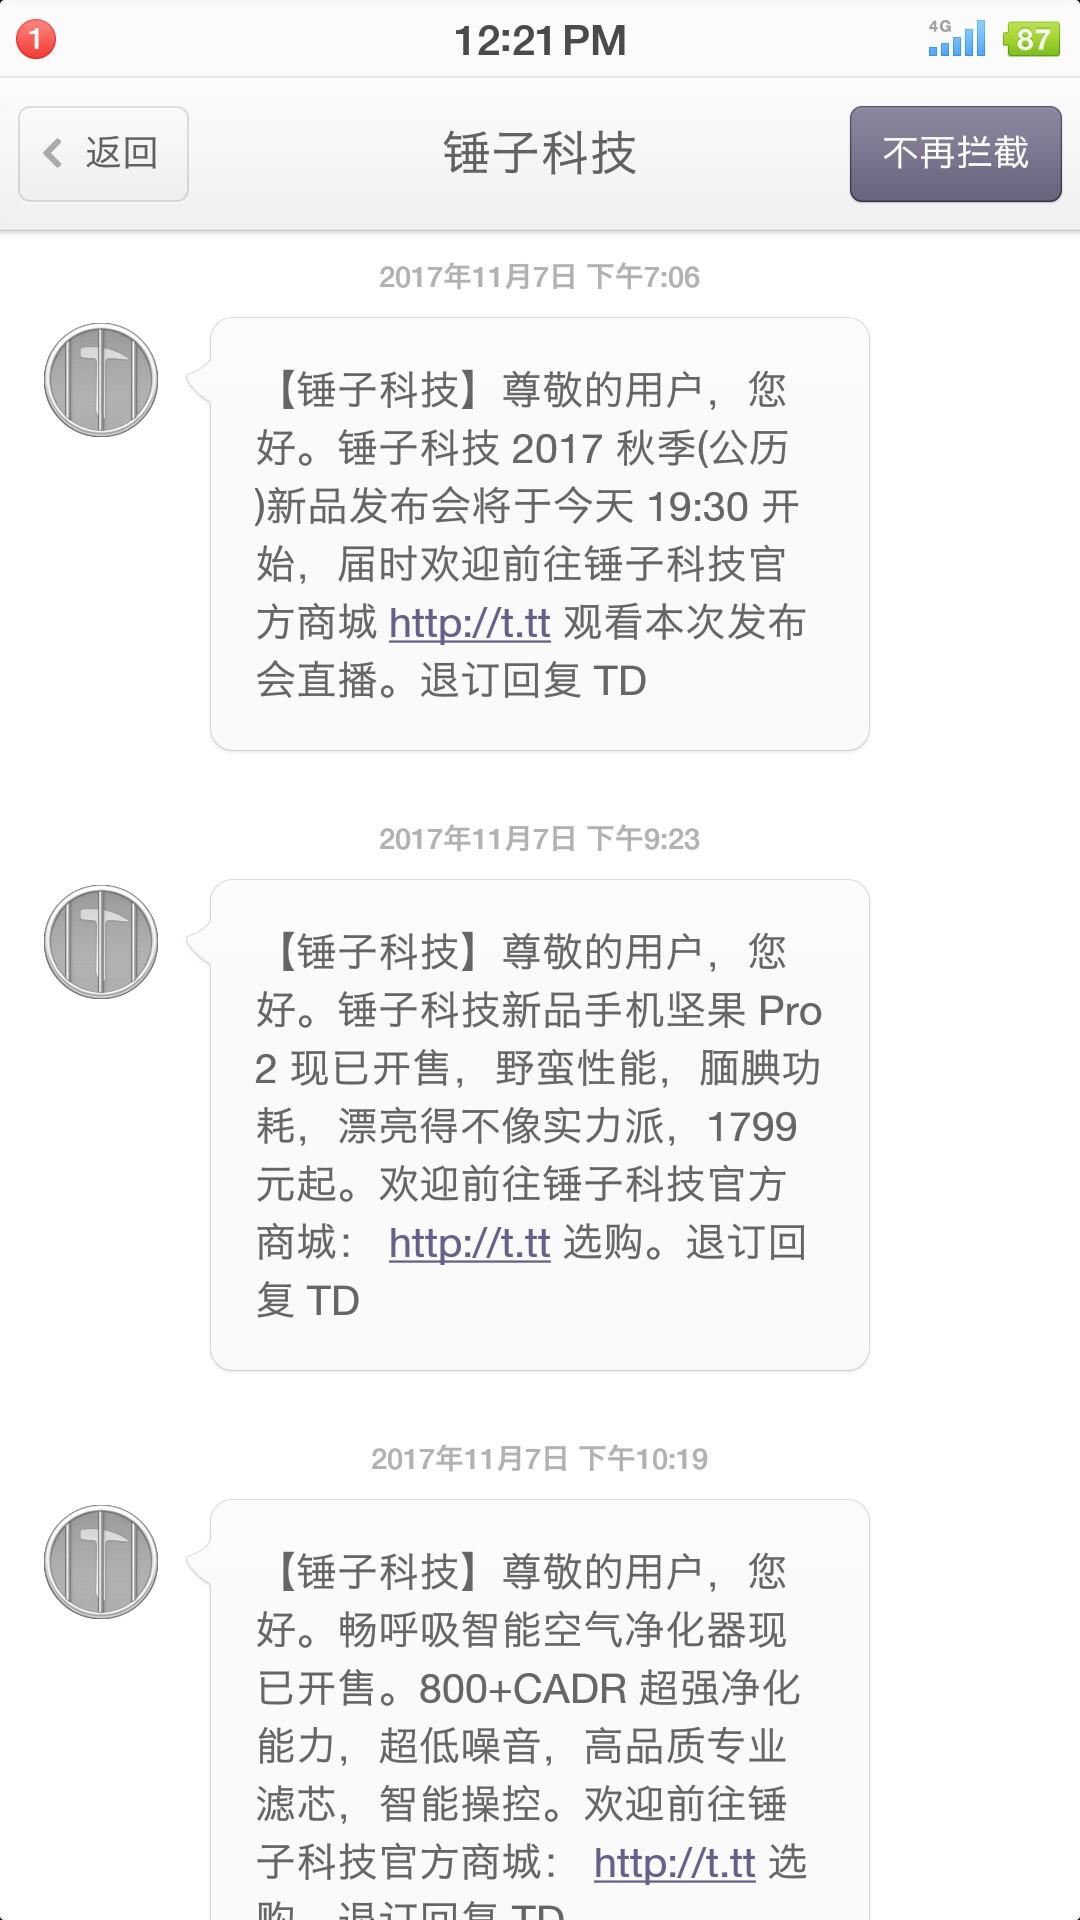 Screenshot_2018-02-12-12-21-35-881_??.png